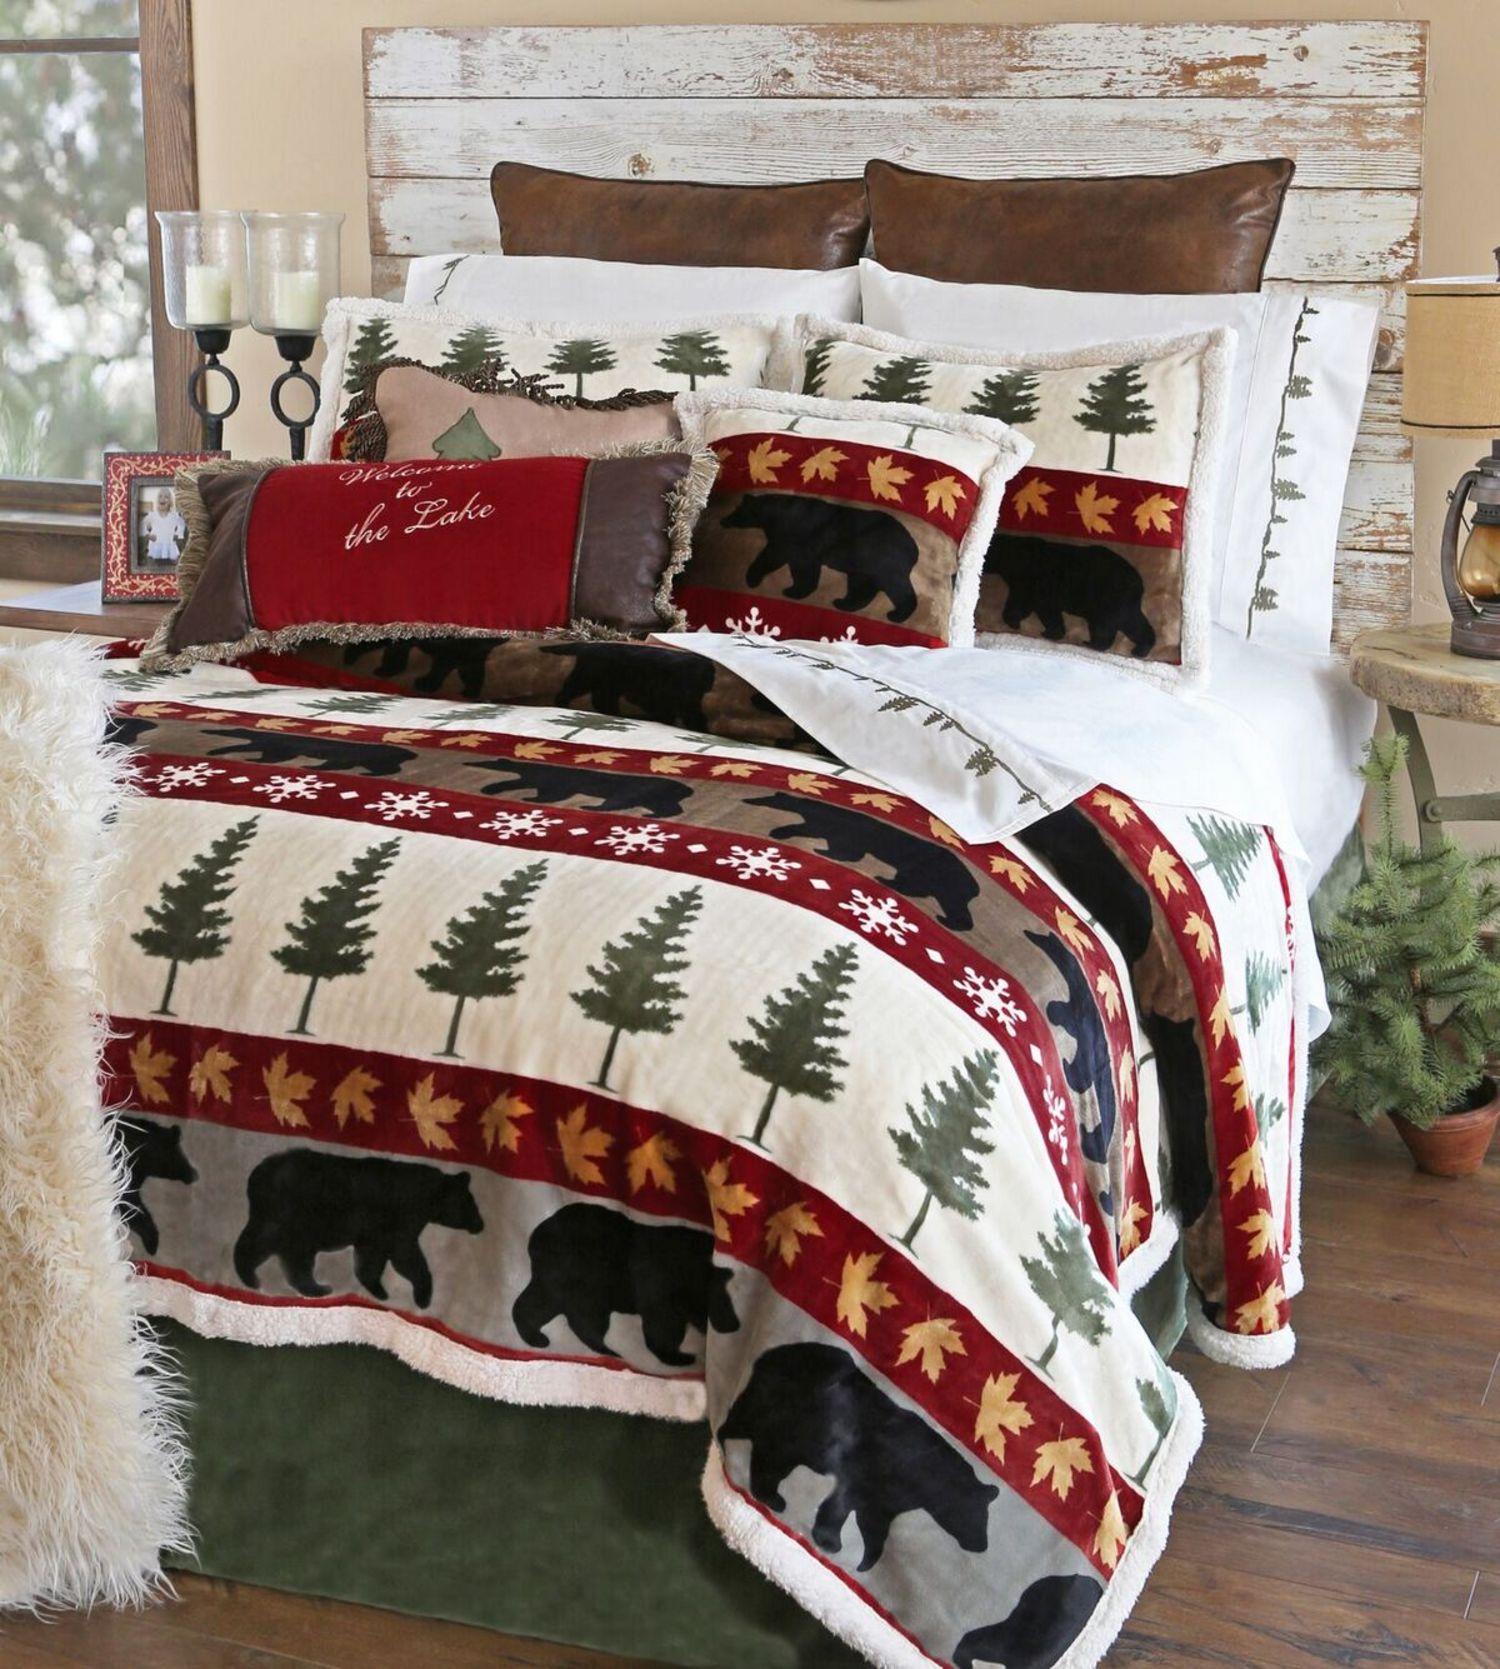 Tall Pine Carstens Lodge Bedding Beddingsuperstore Com